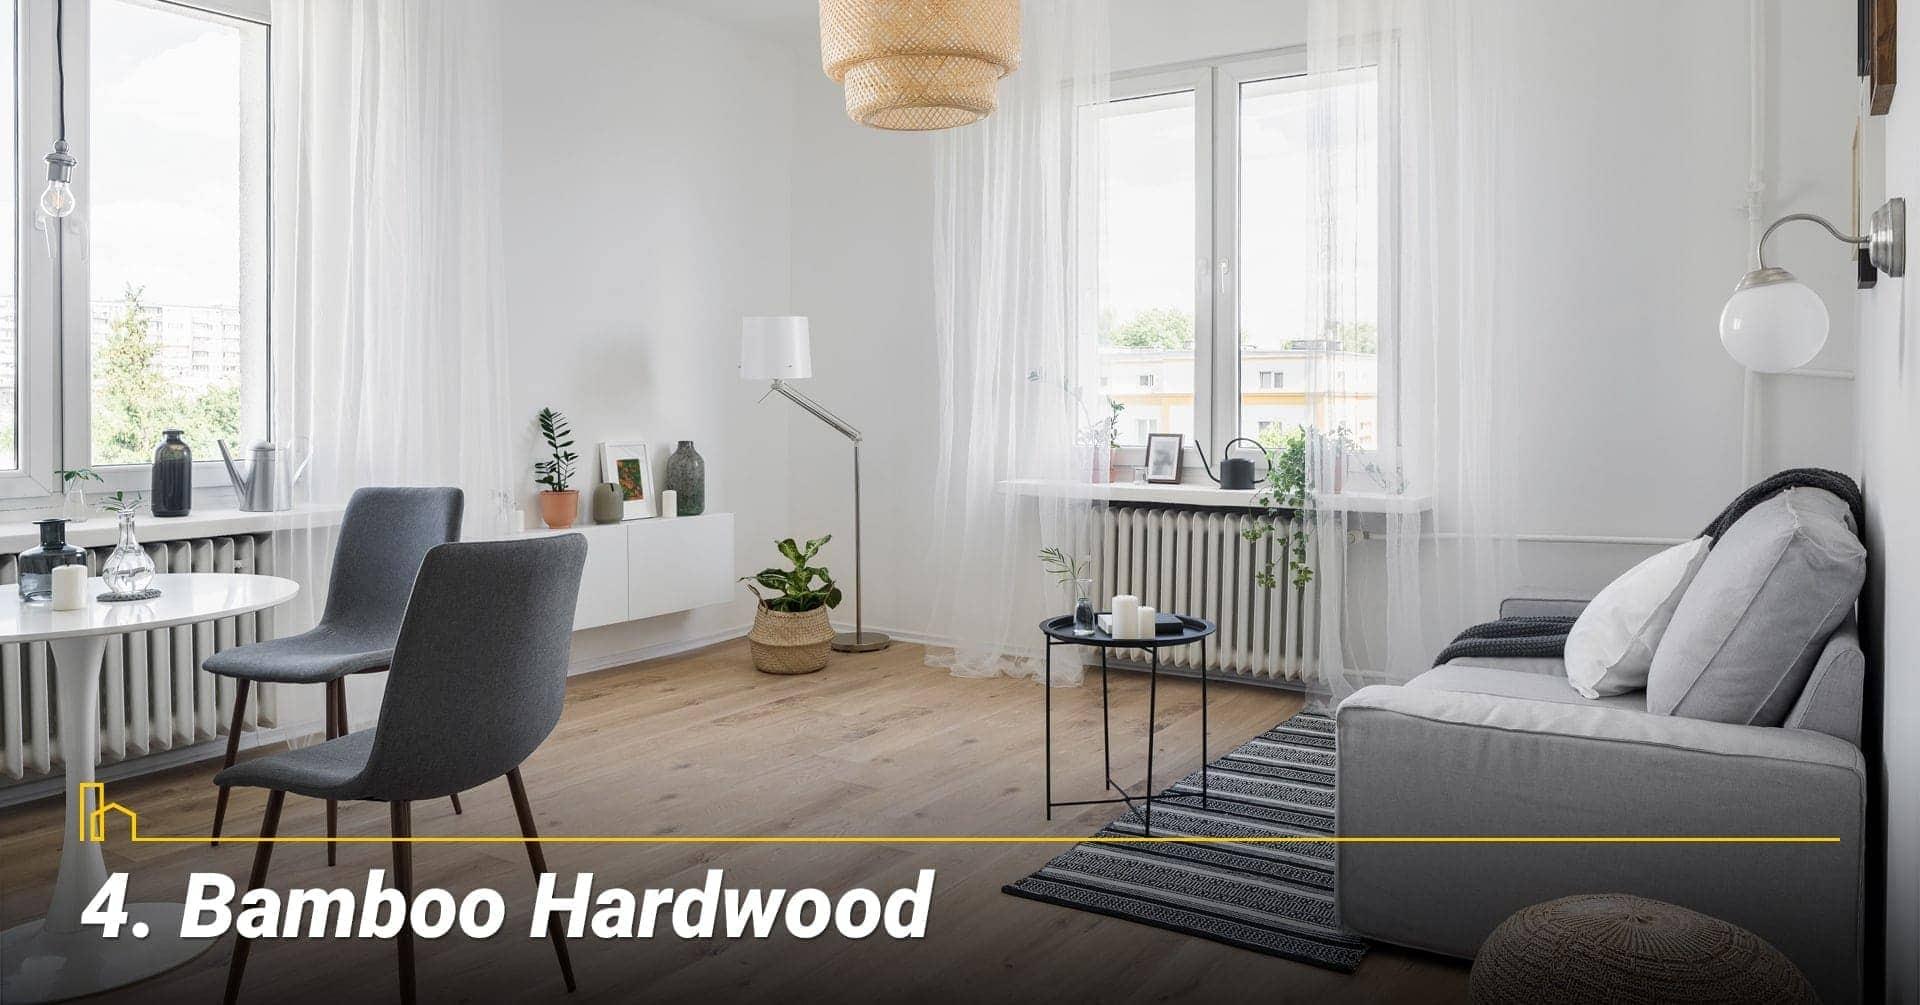 Bamboo Hardwood, cover your floor with bamboo hardwood